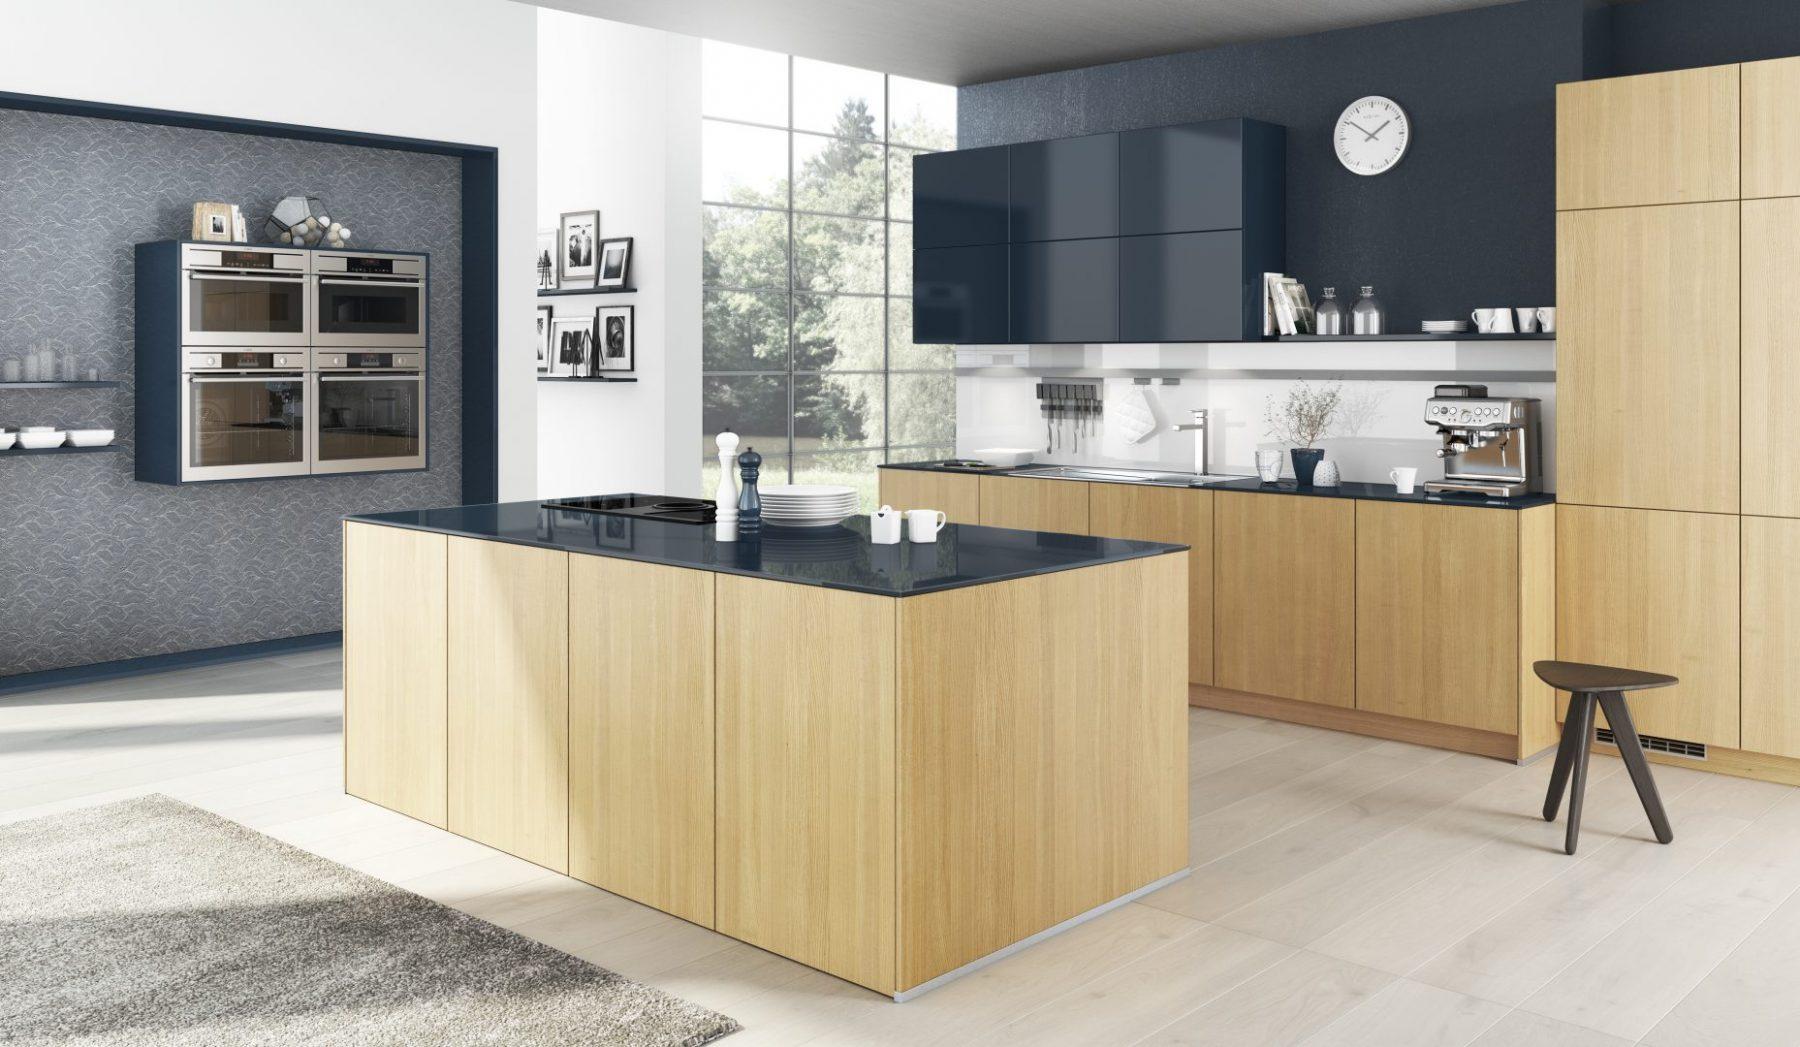 Bauforma-Küche-Holz